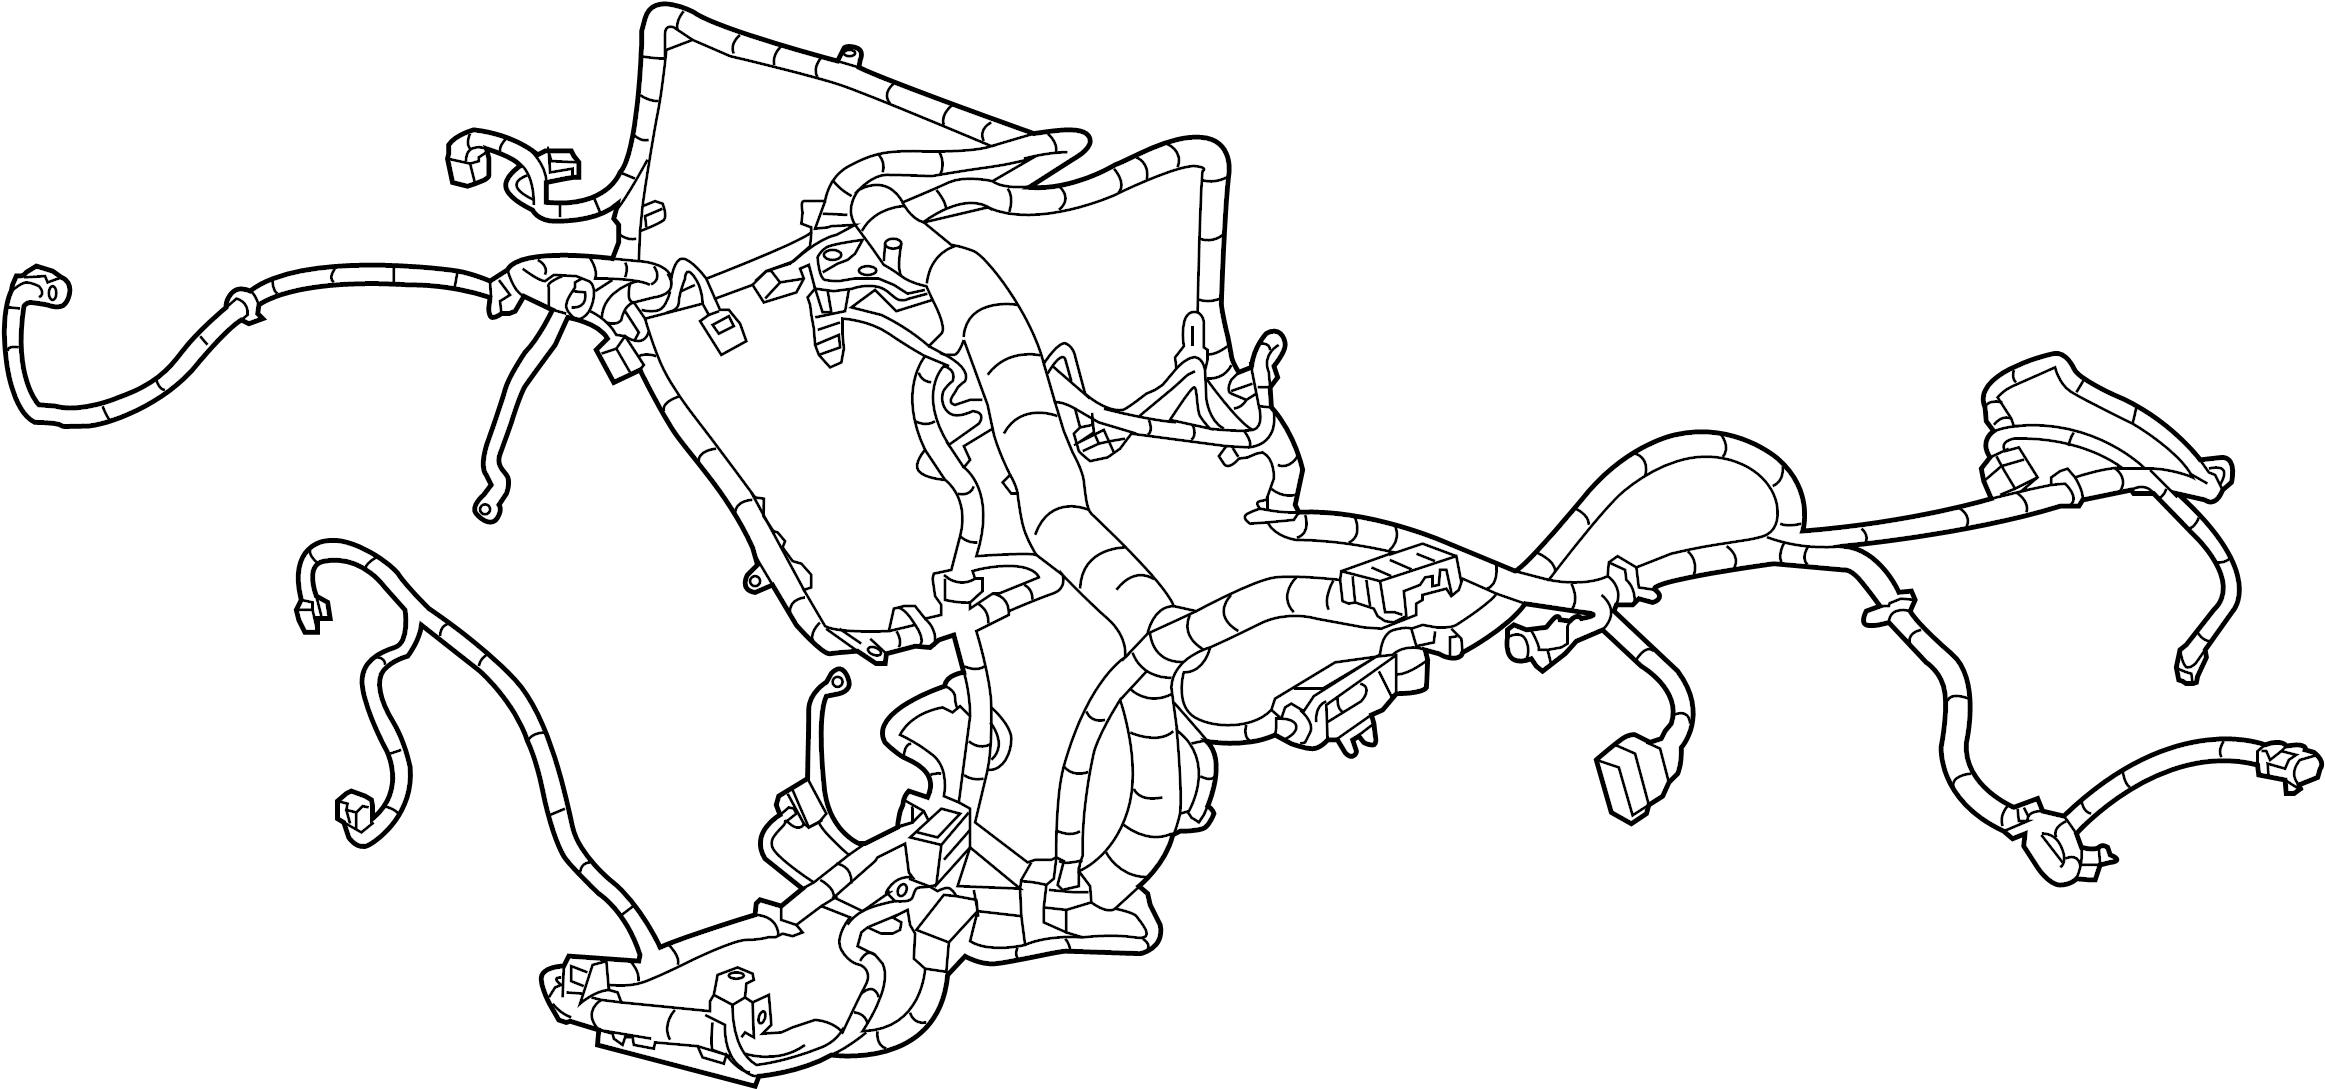 Chevrolet Silverado Hd Engine Wiring Harness 6 0